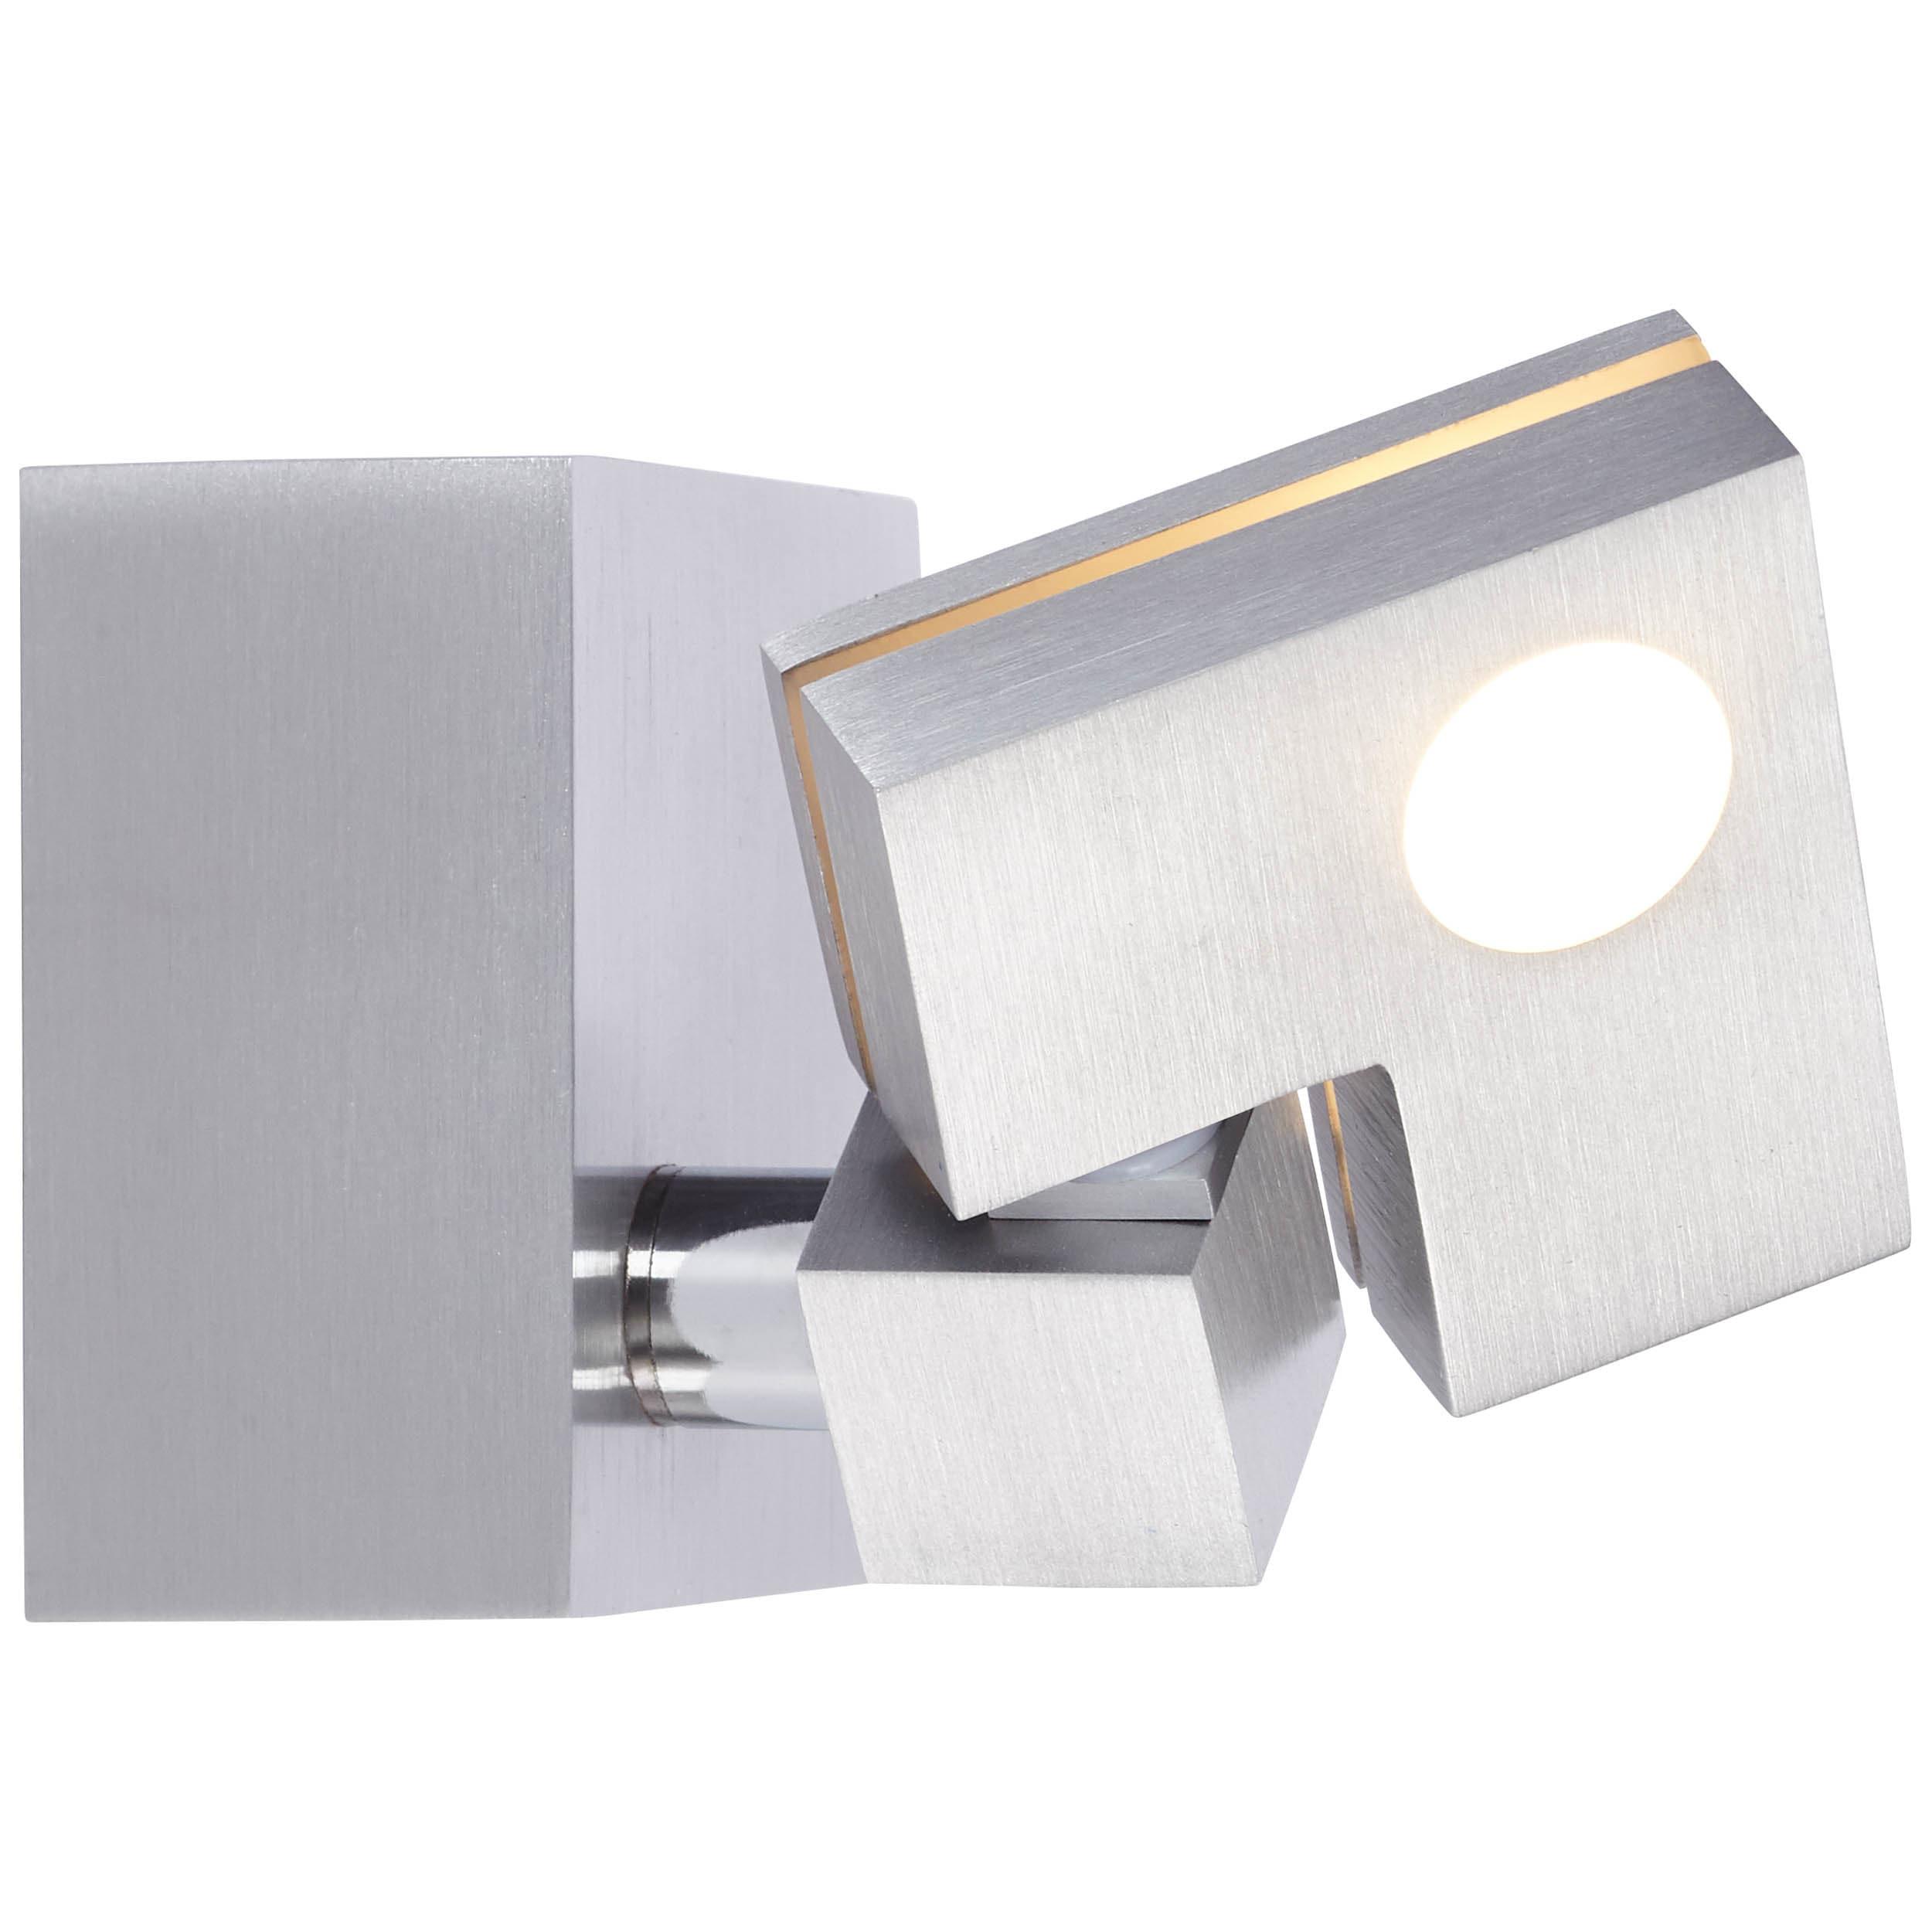 Brilliant Leuchten Wandleuchte, Warmweiß, 90 Degree LED Wandspot